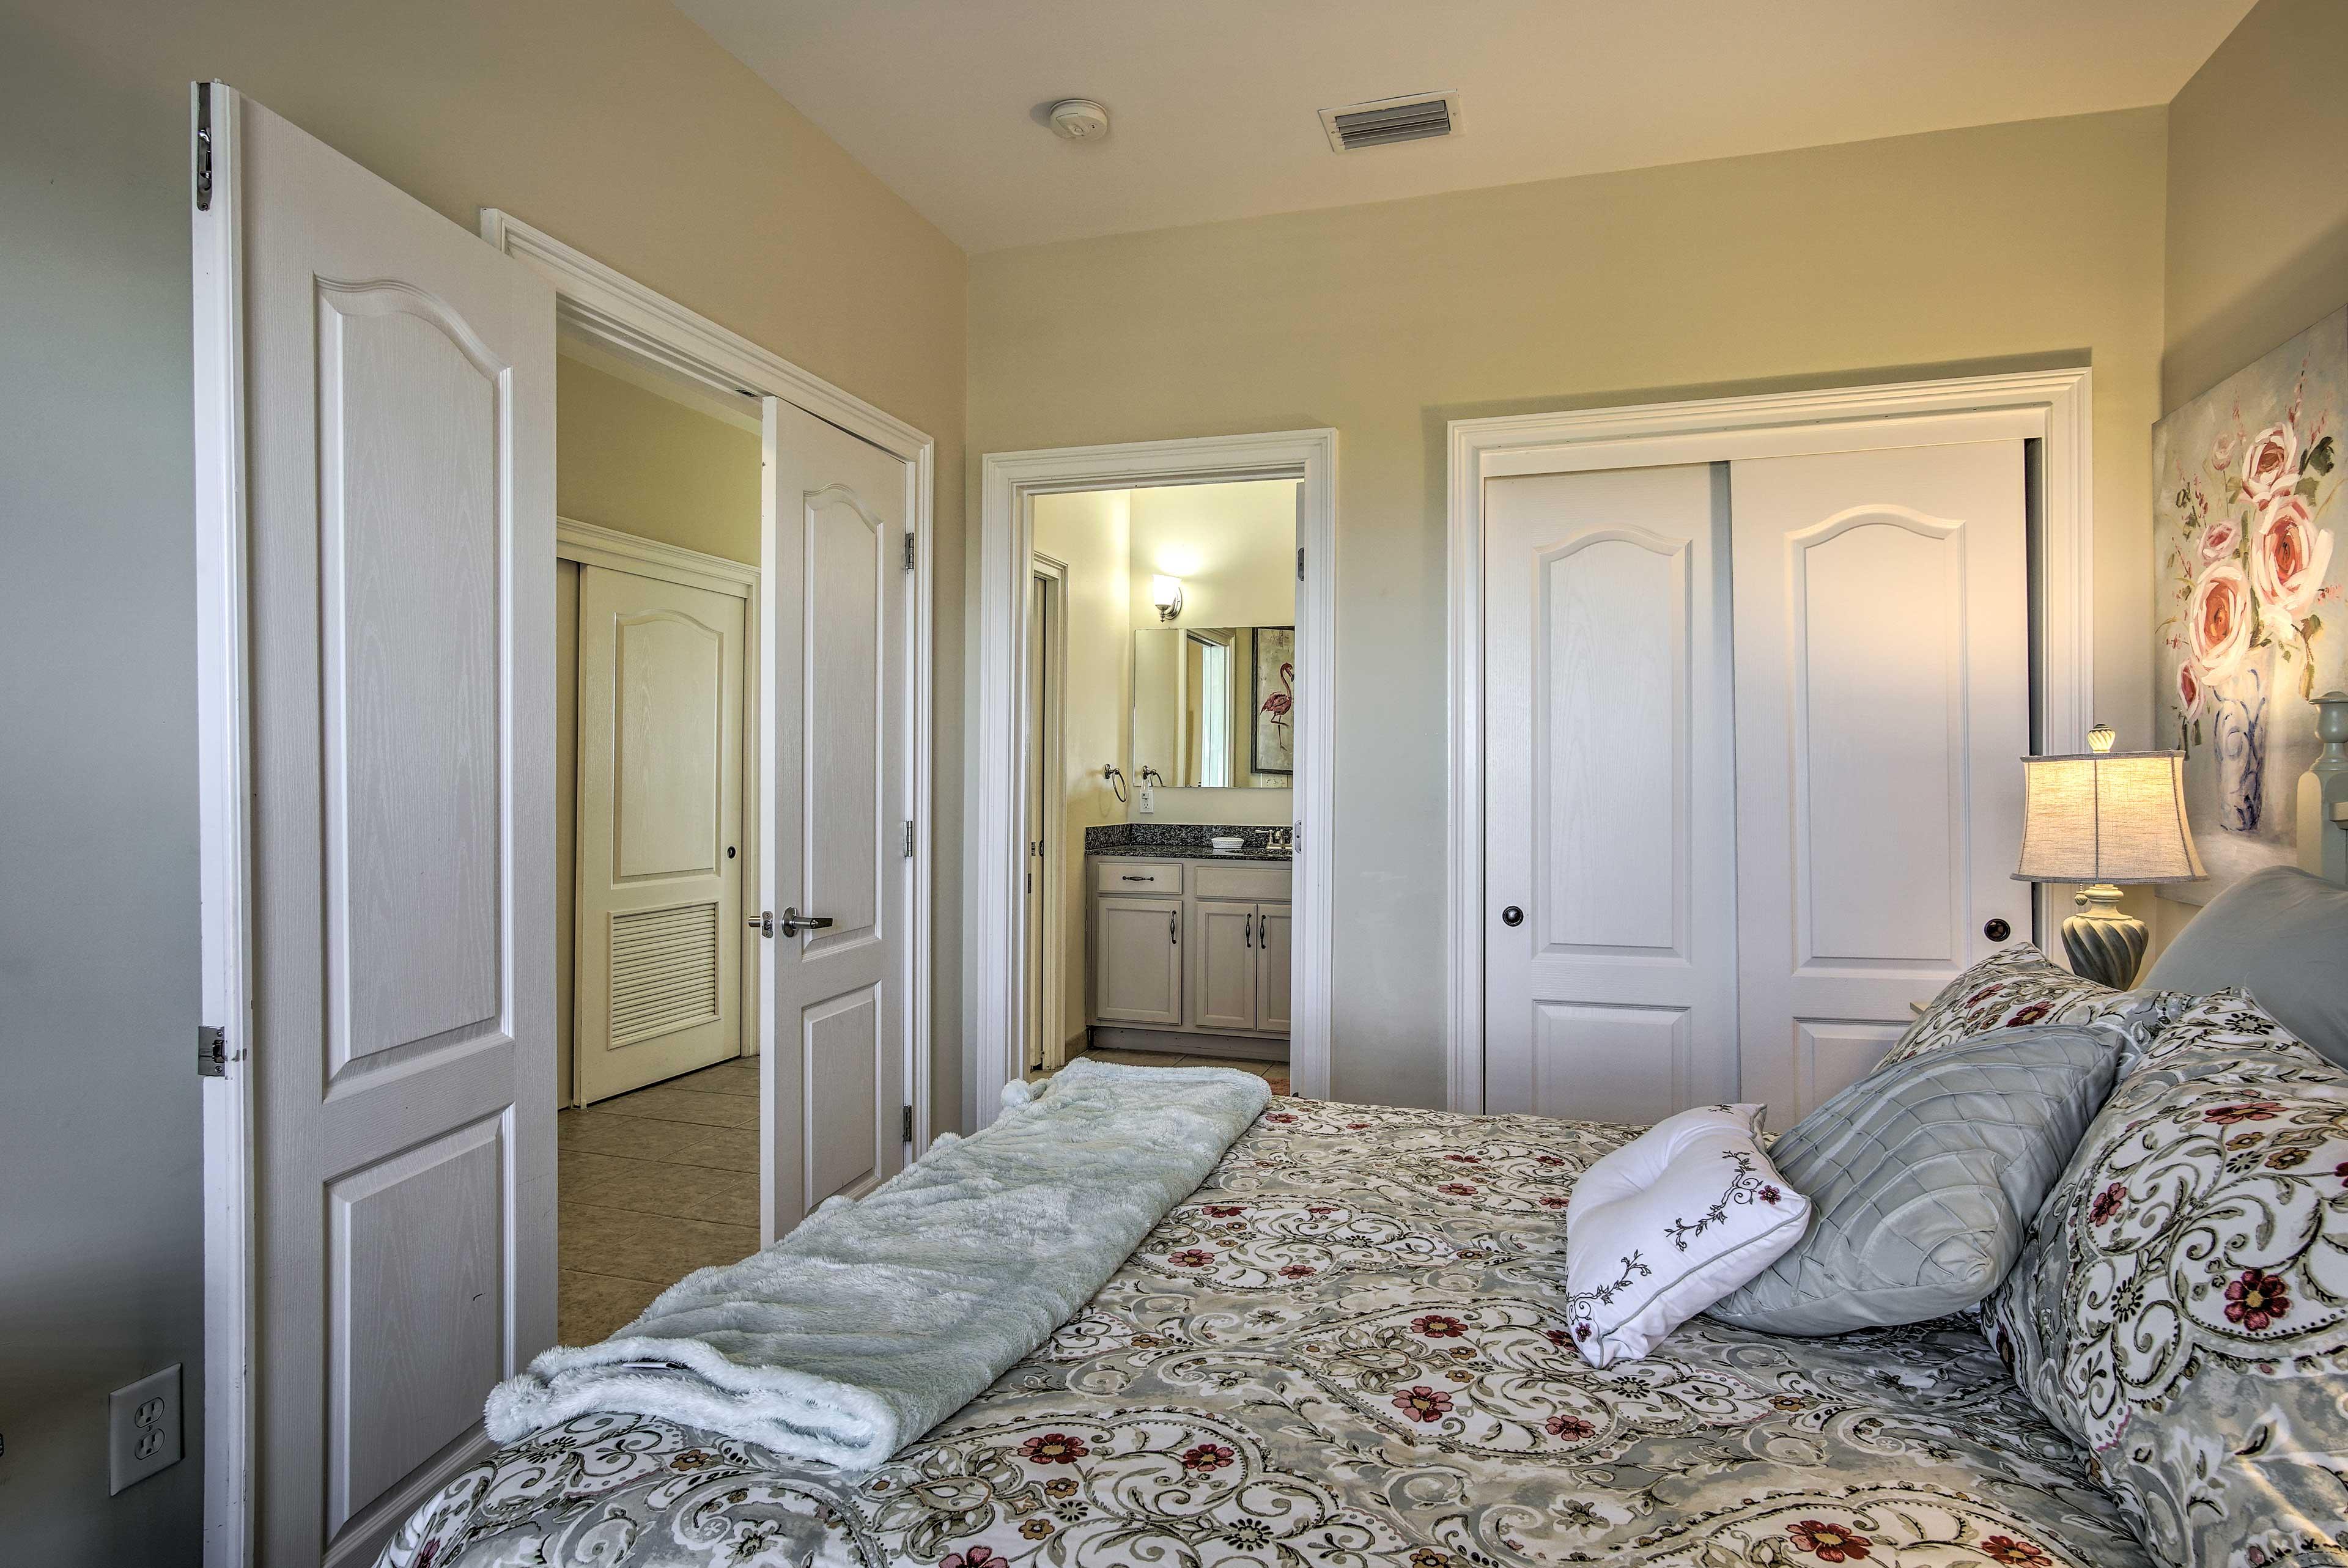 There is an en-suite bathroom in the master bedroom.